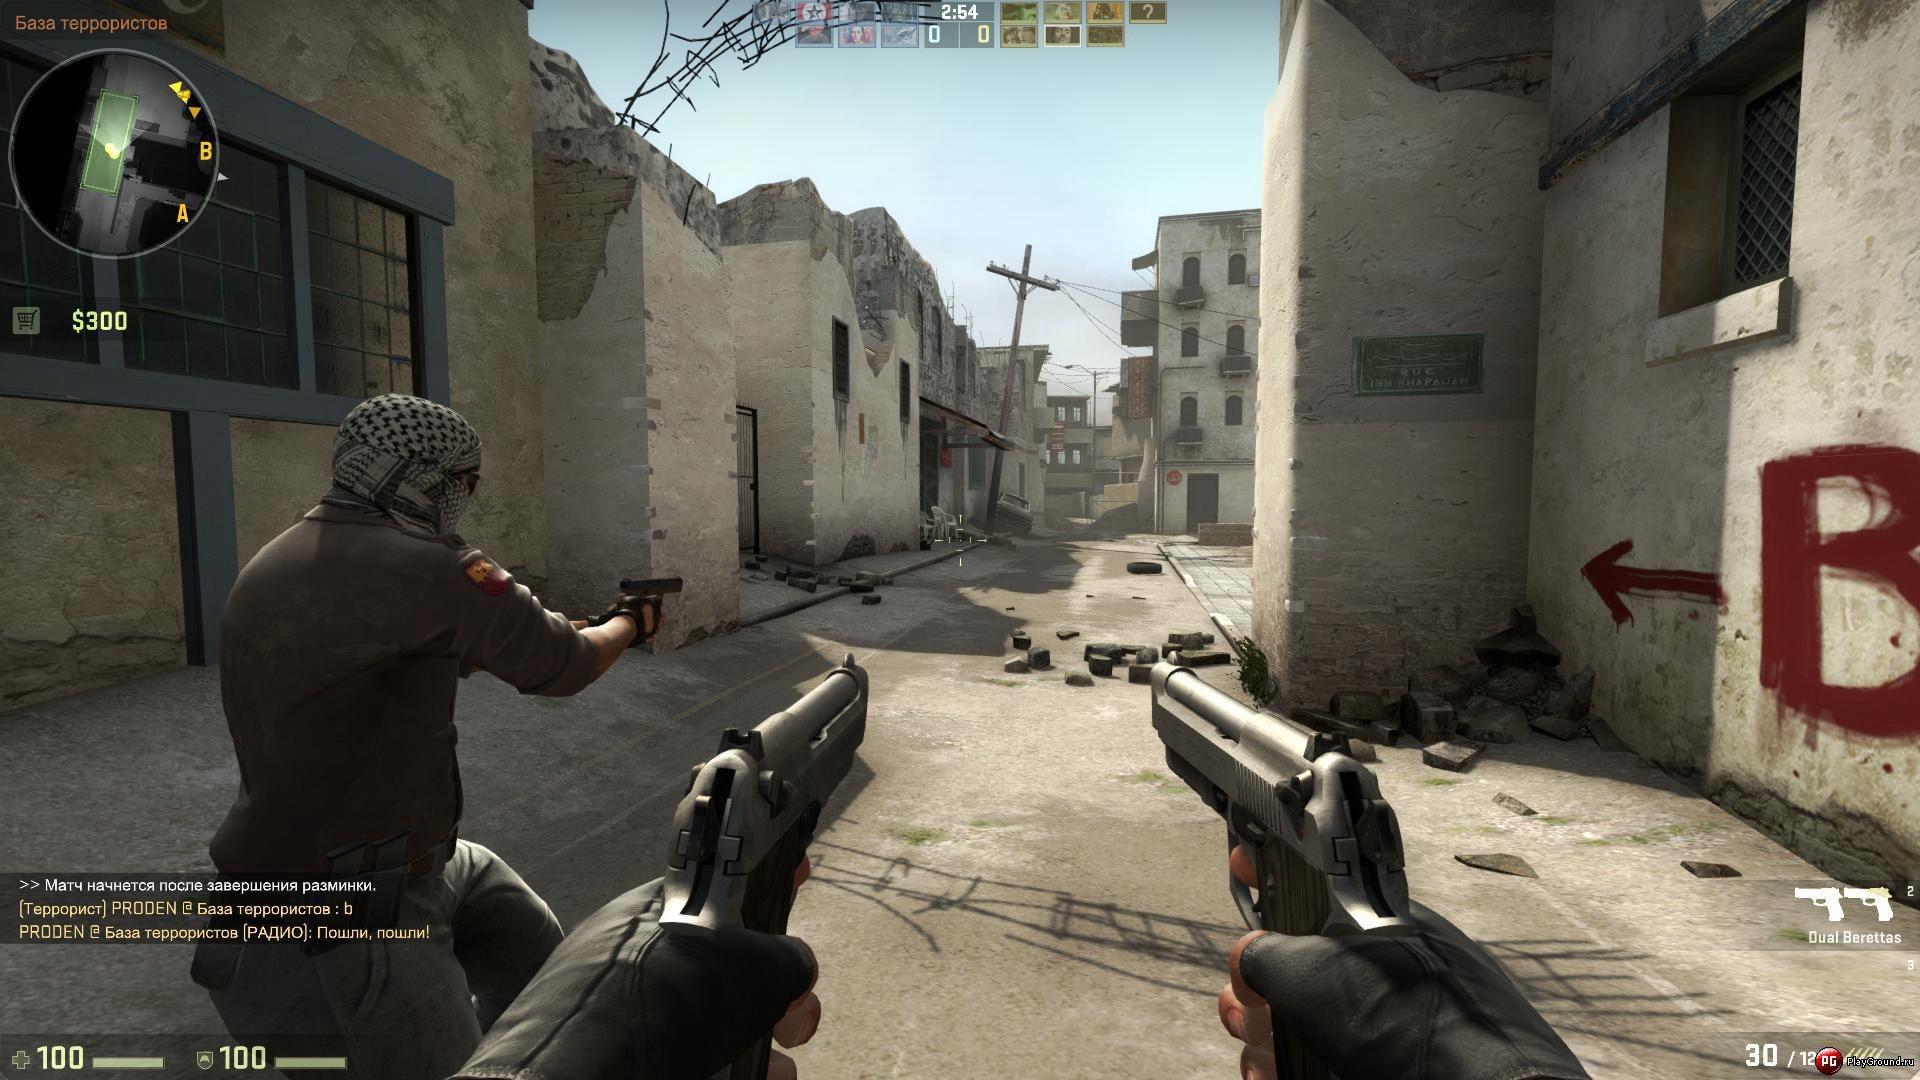 بازی Counter-Strike Global Offensive Prime Status